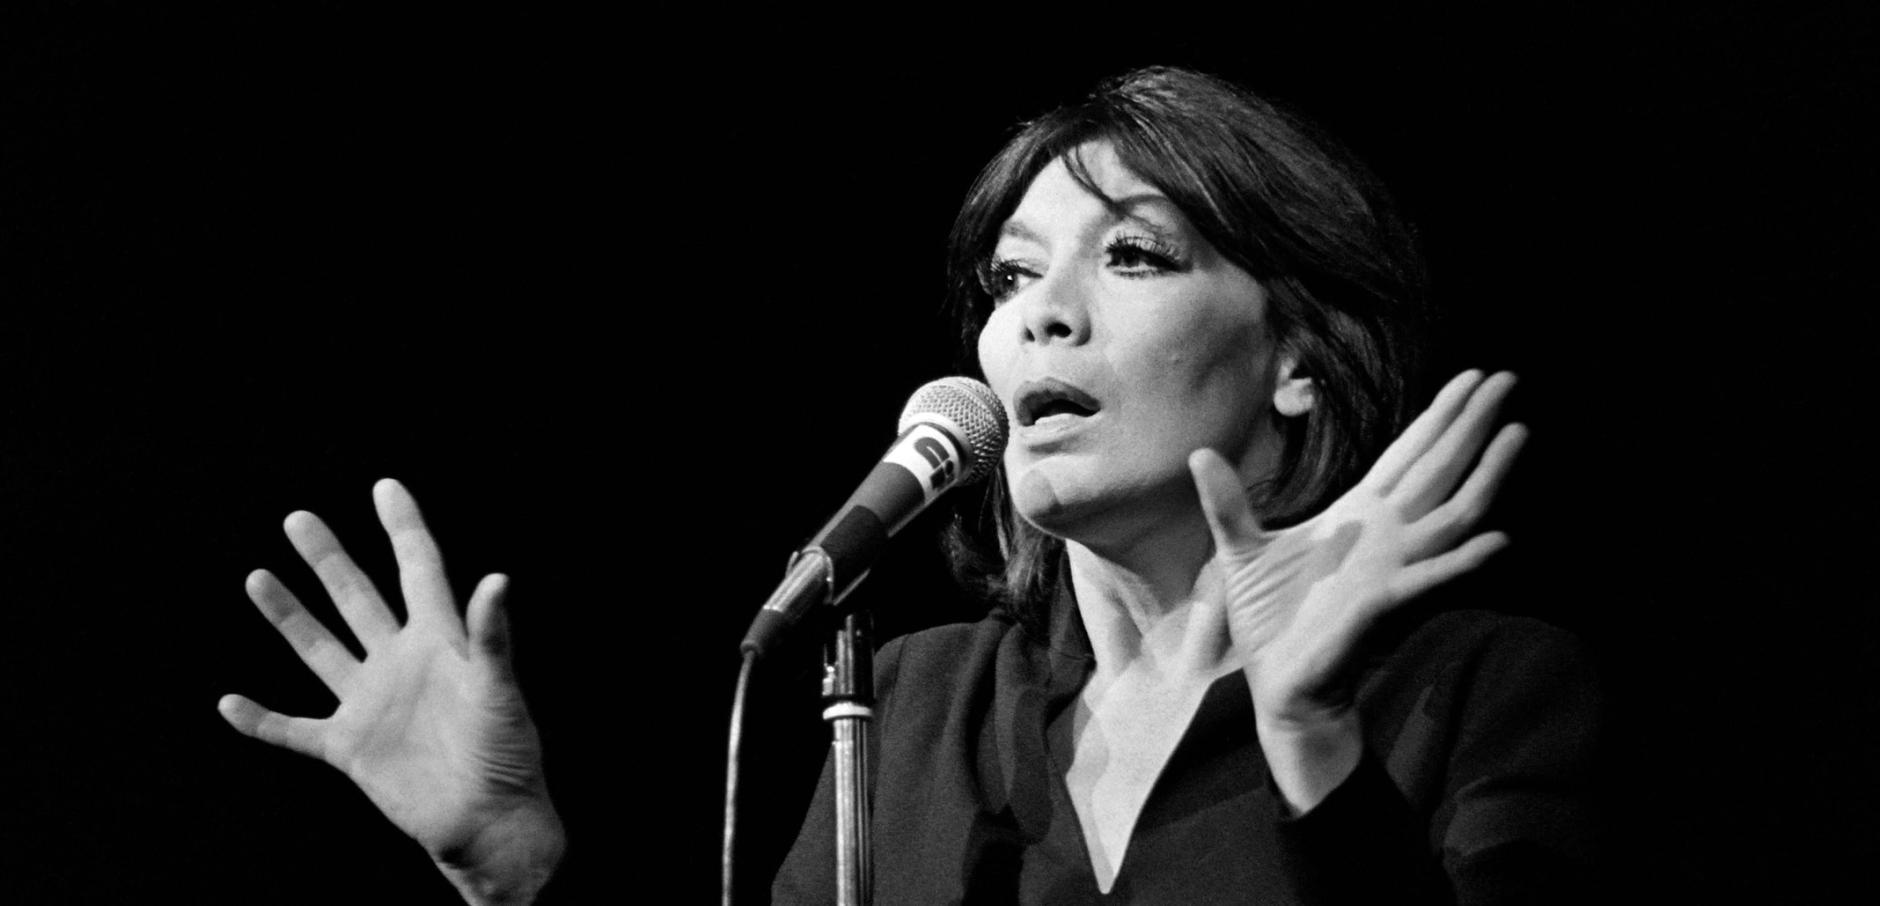 Juliette Greco gestorben